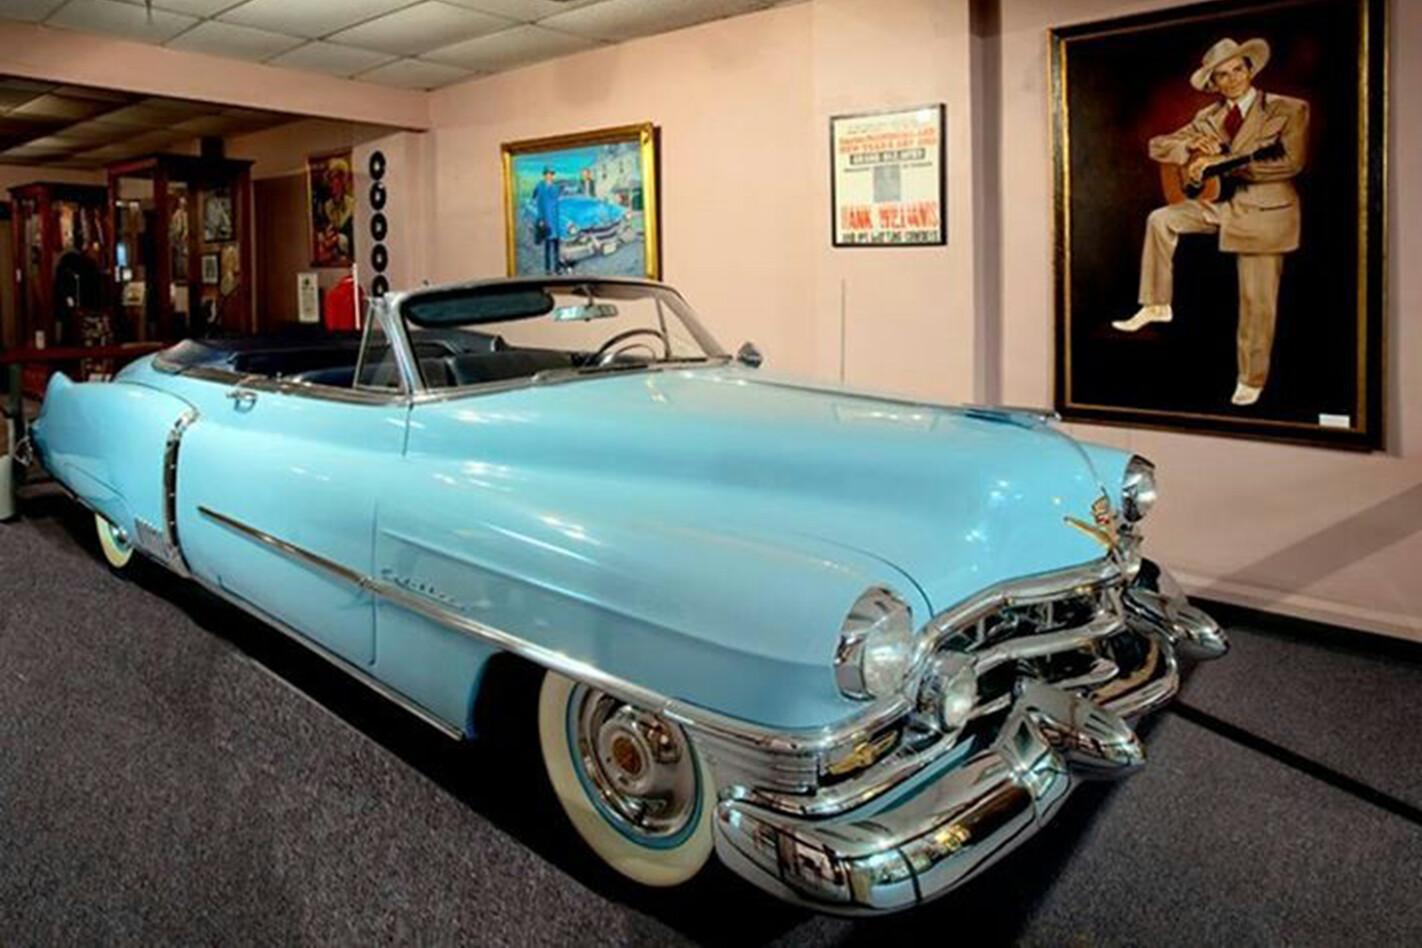 Hank Williams' Cadillac